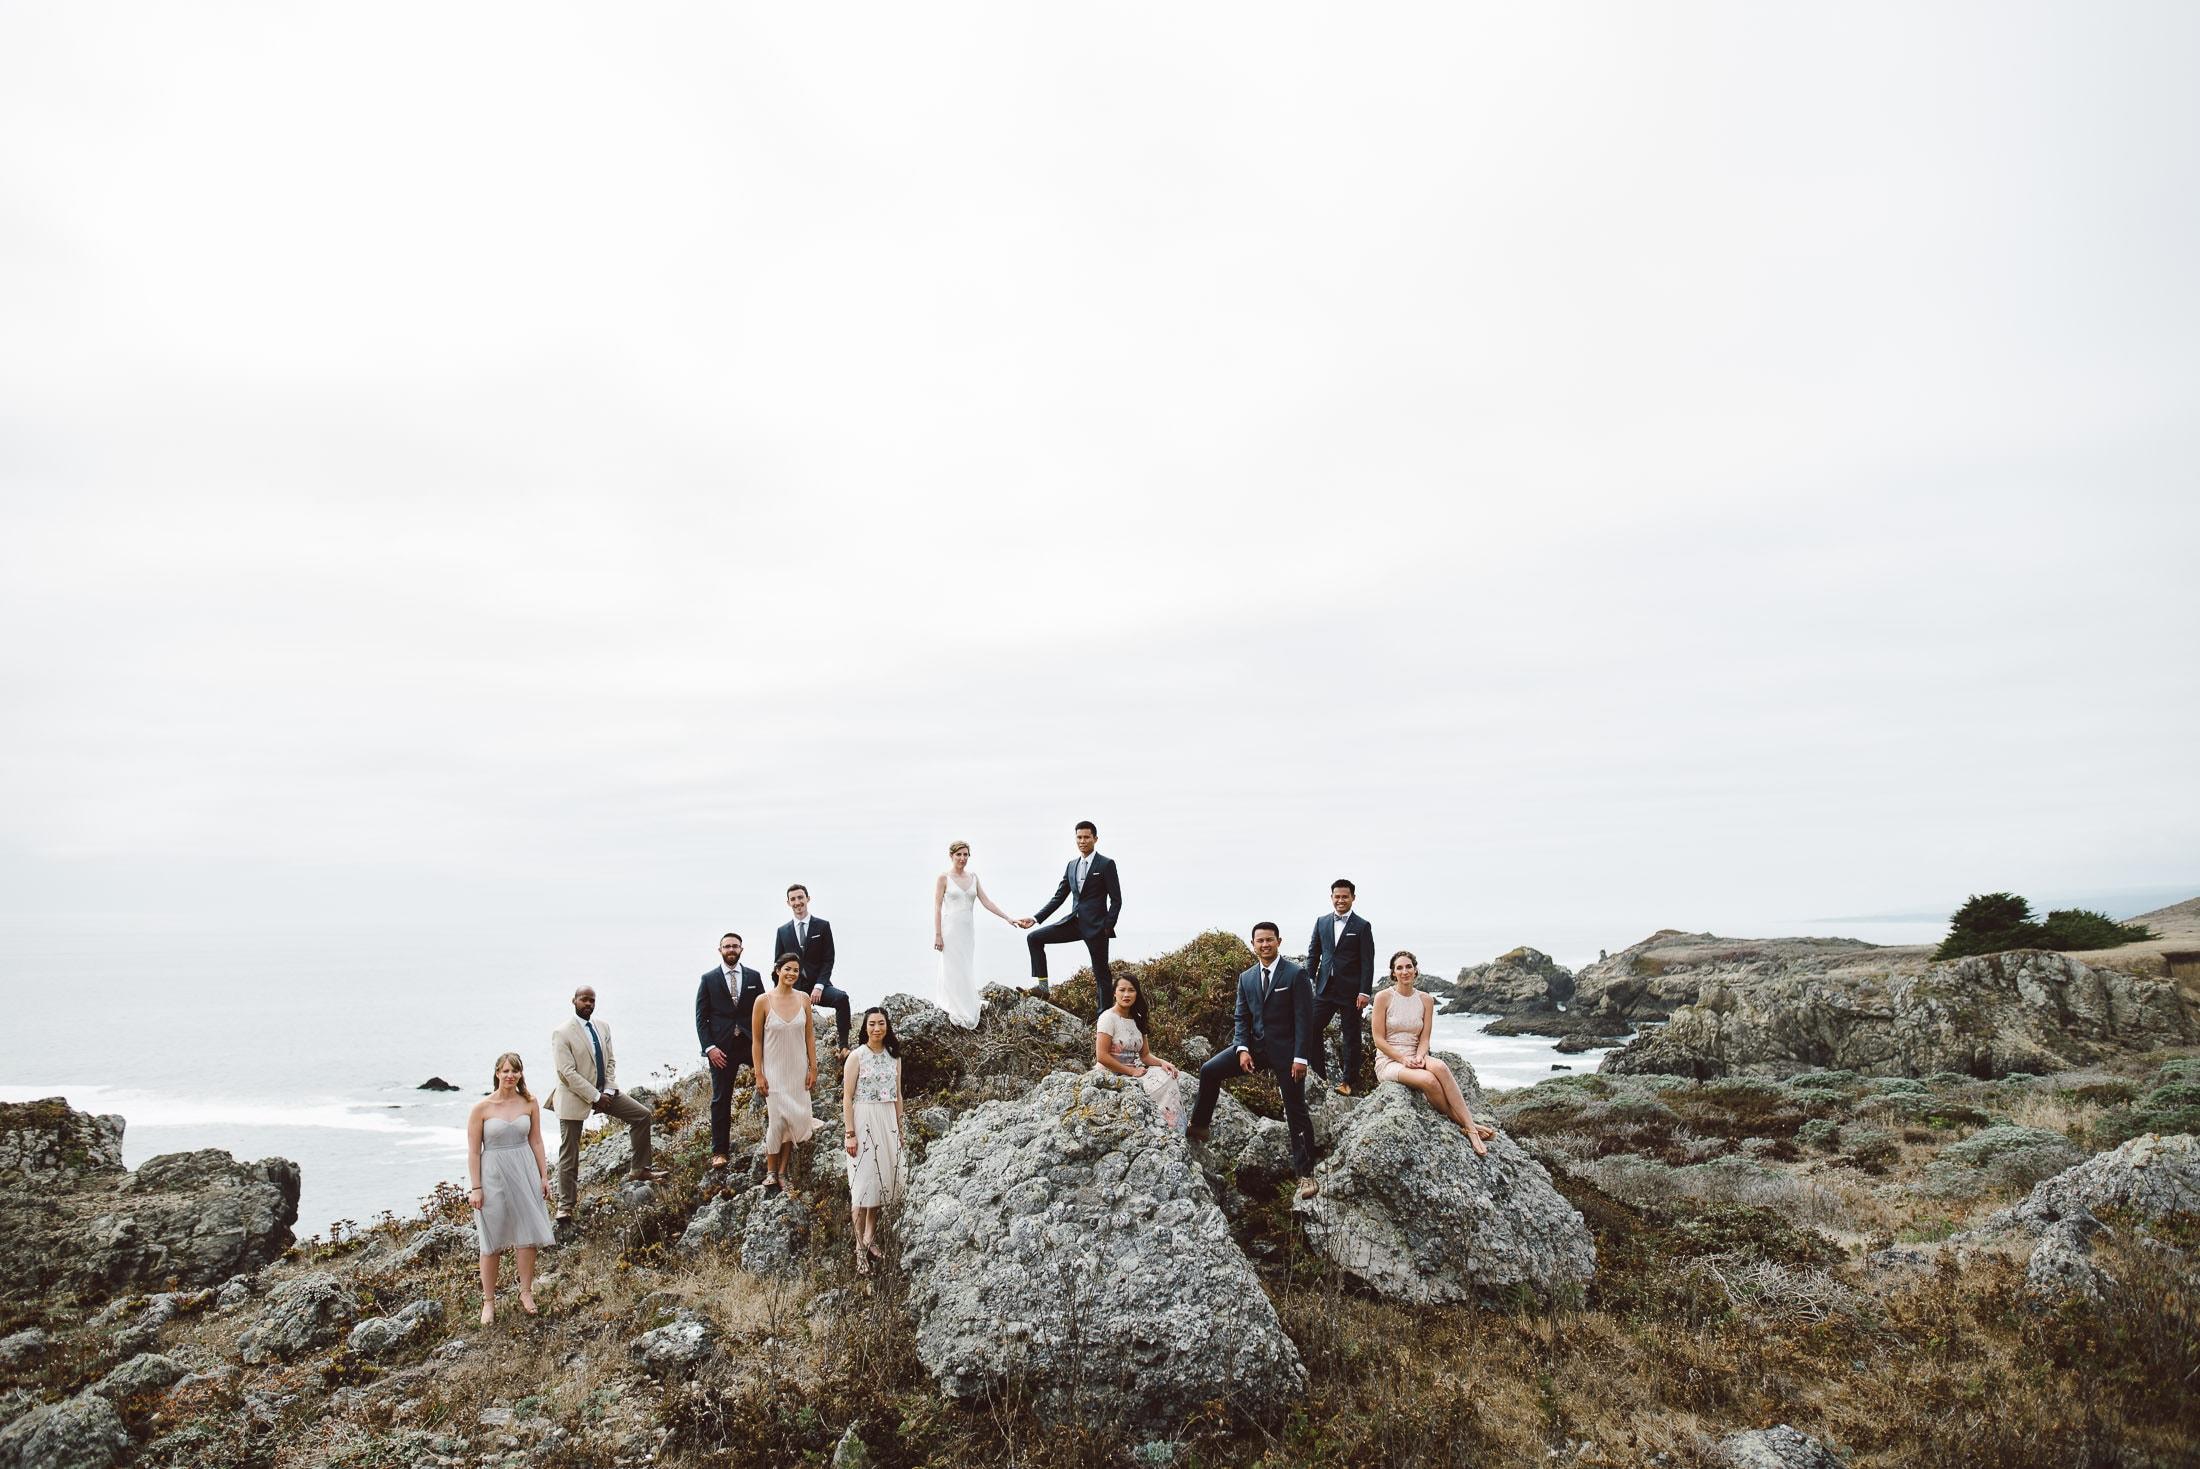 architects sea ranch wedding party portrait